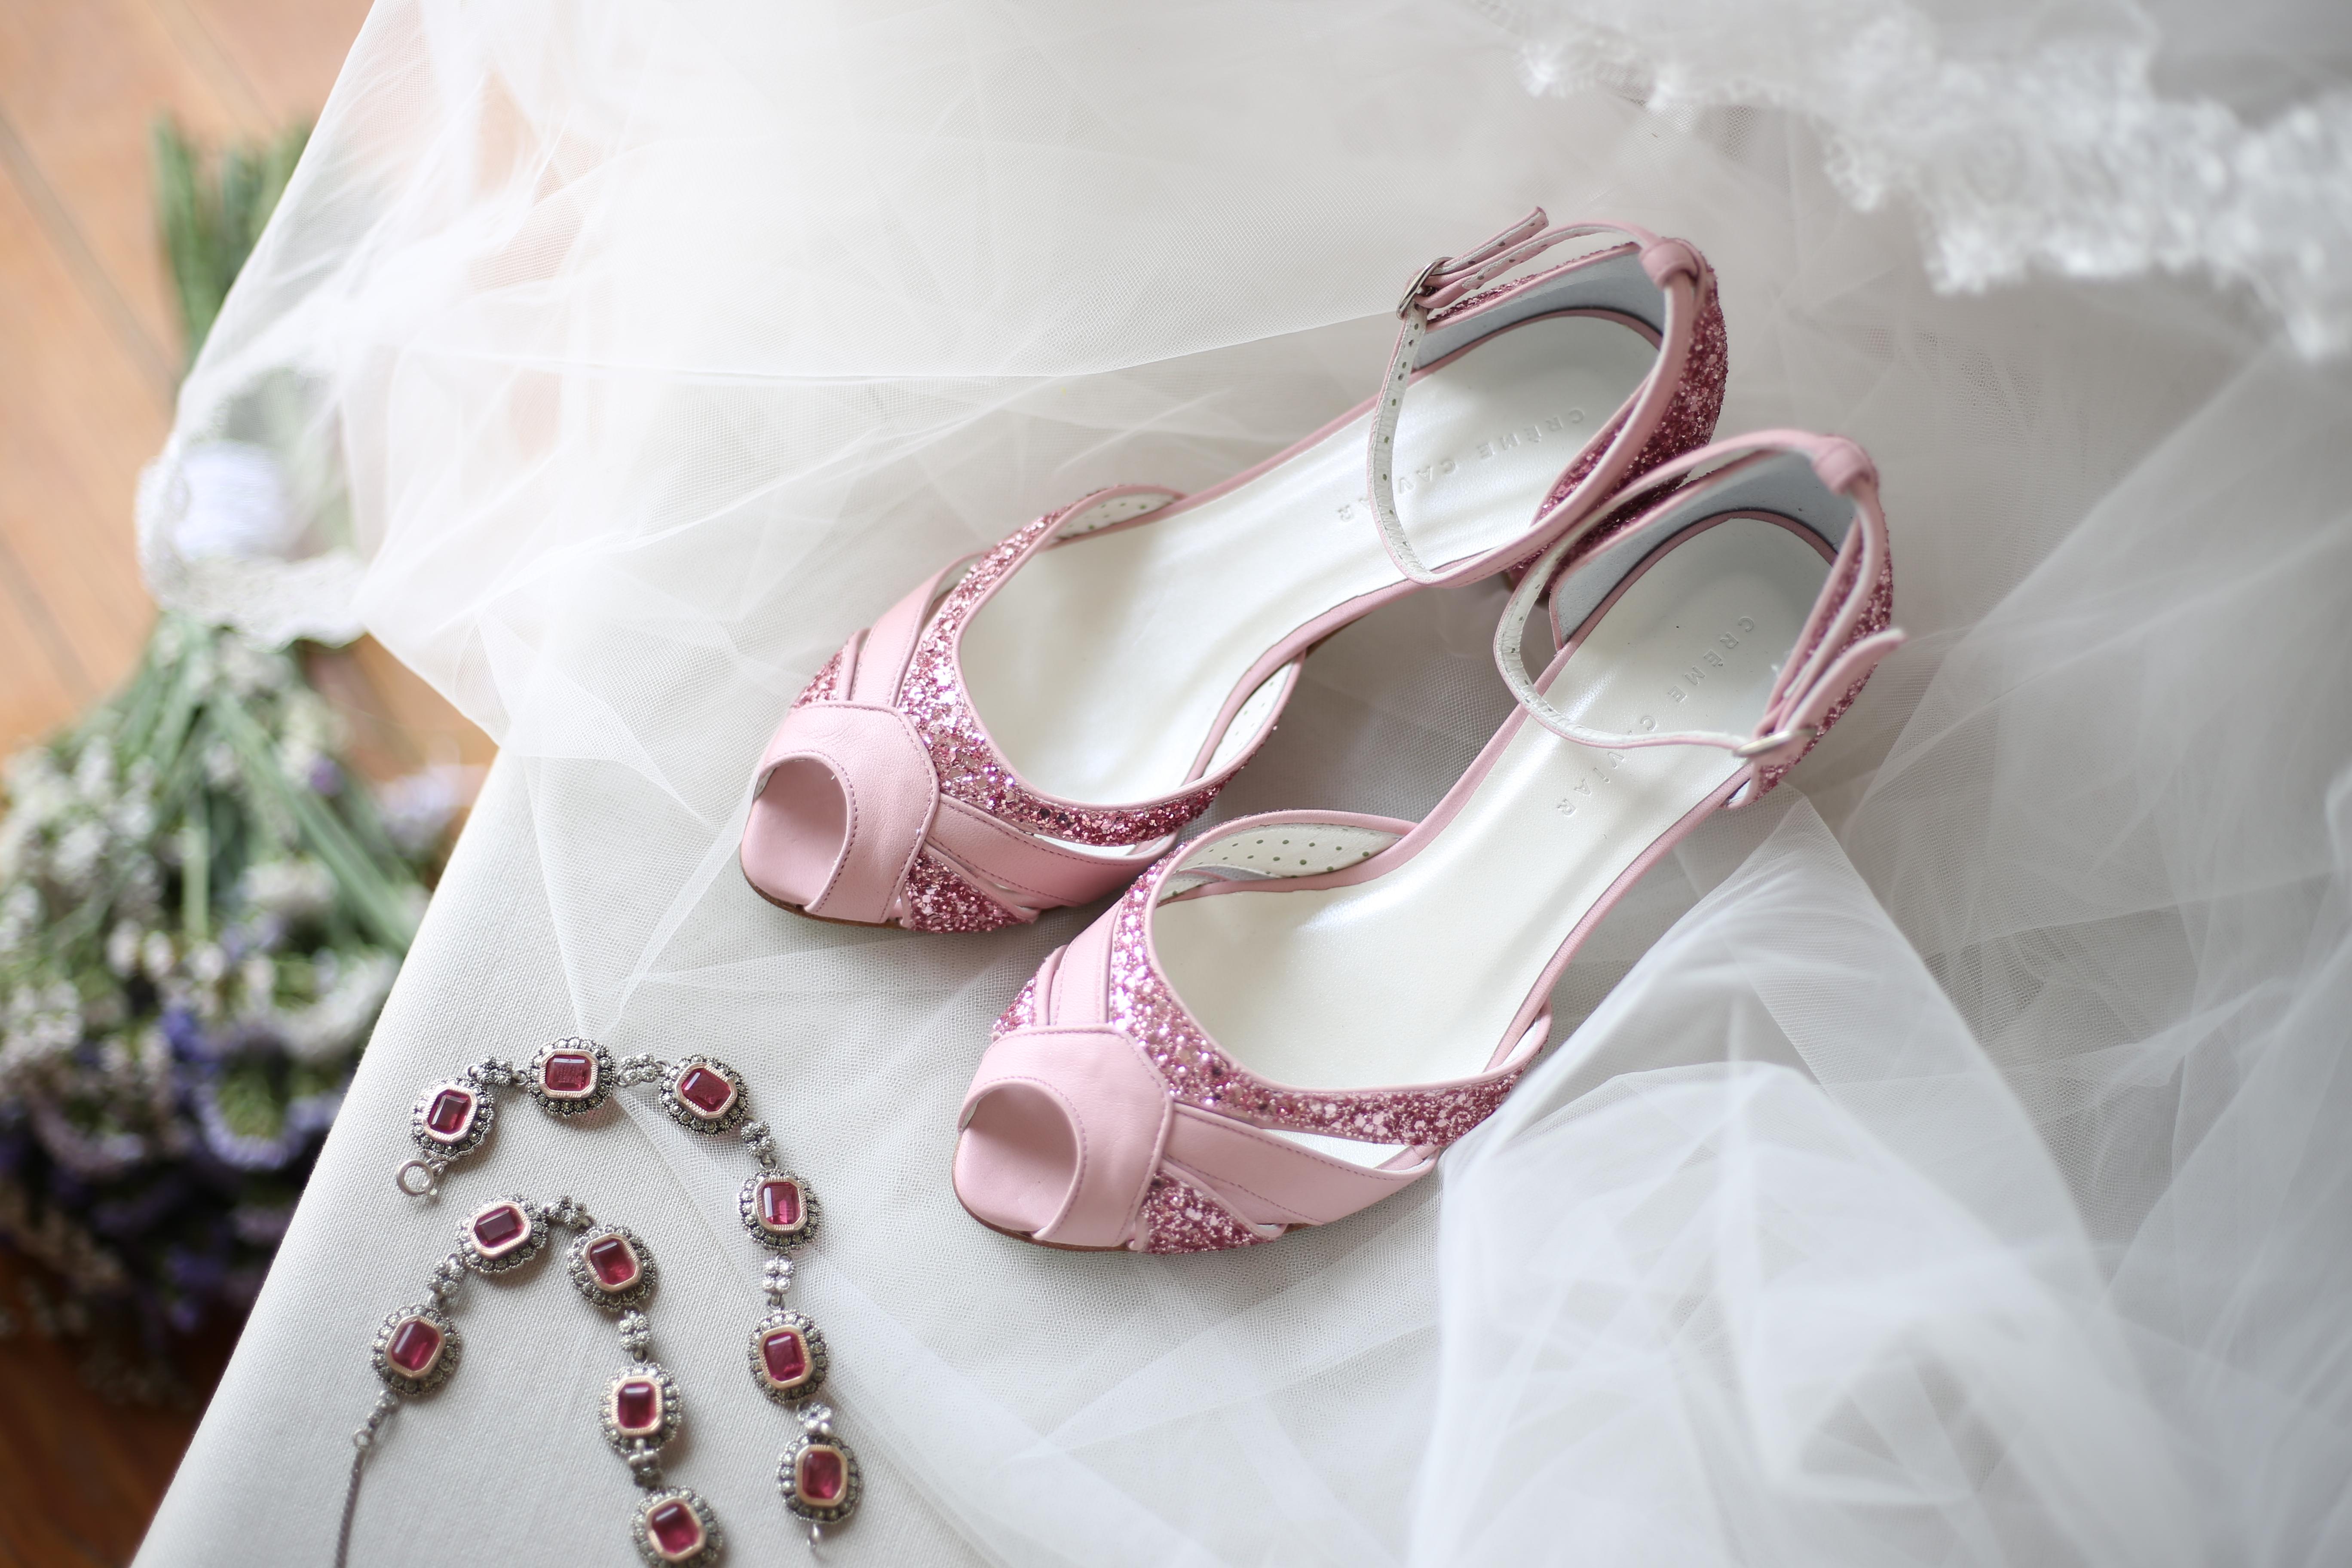 Glow 2 - Sapatos de noiva personalizados